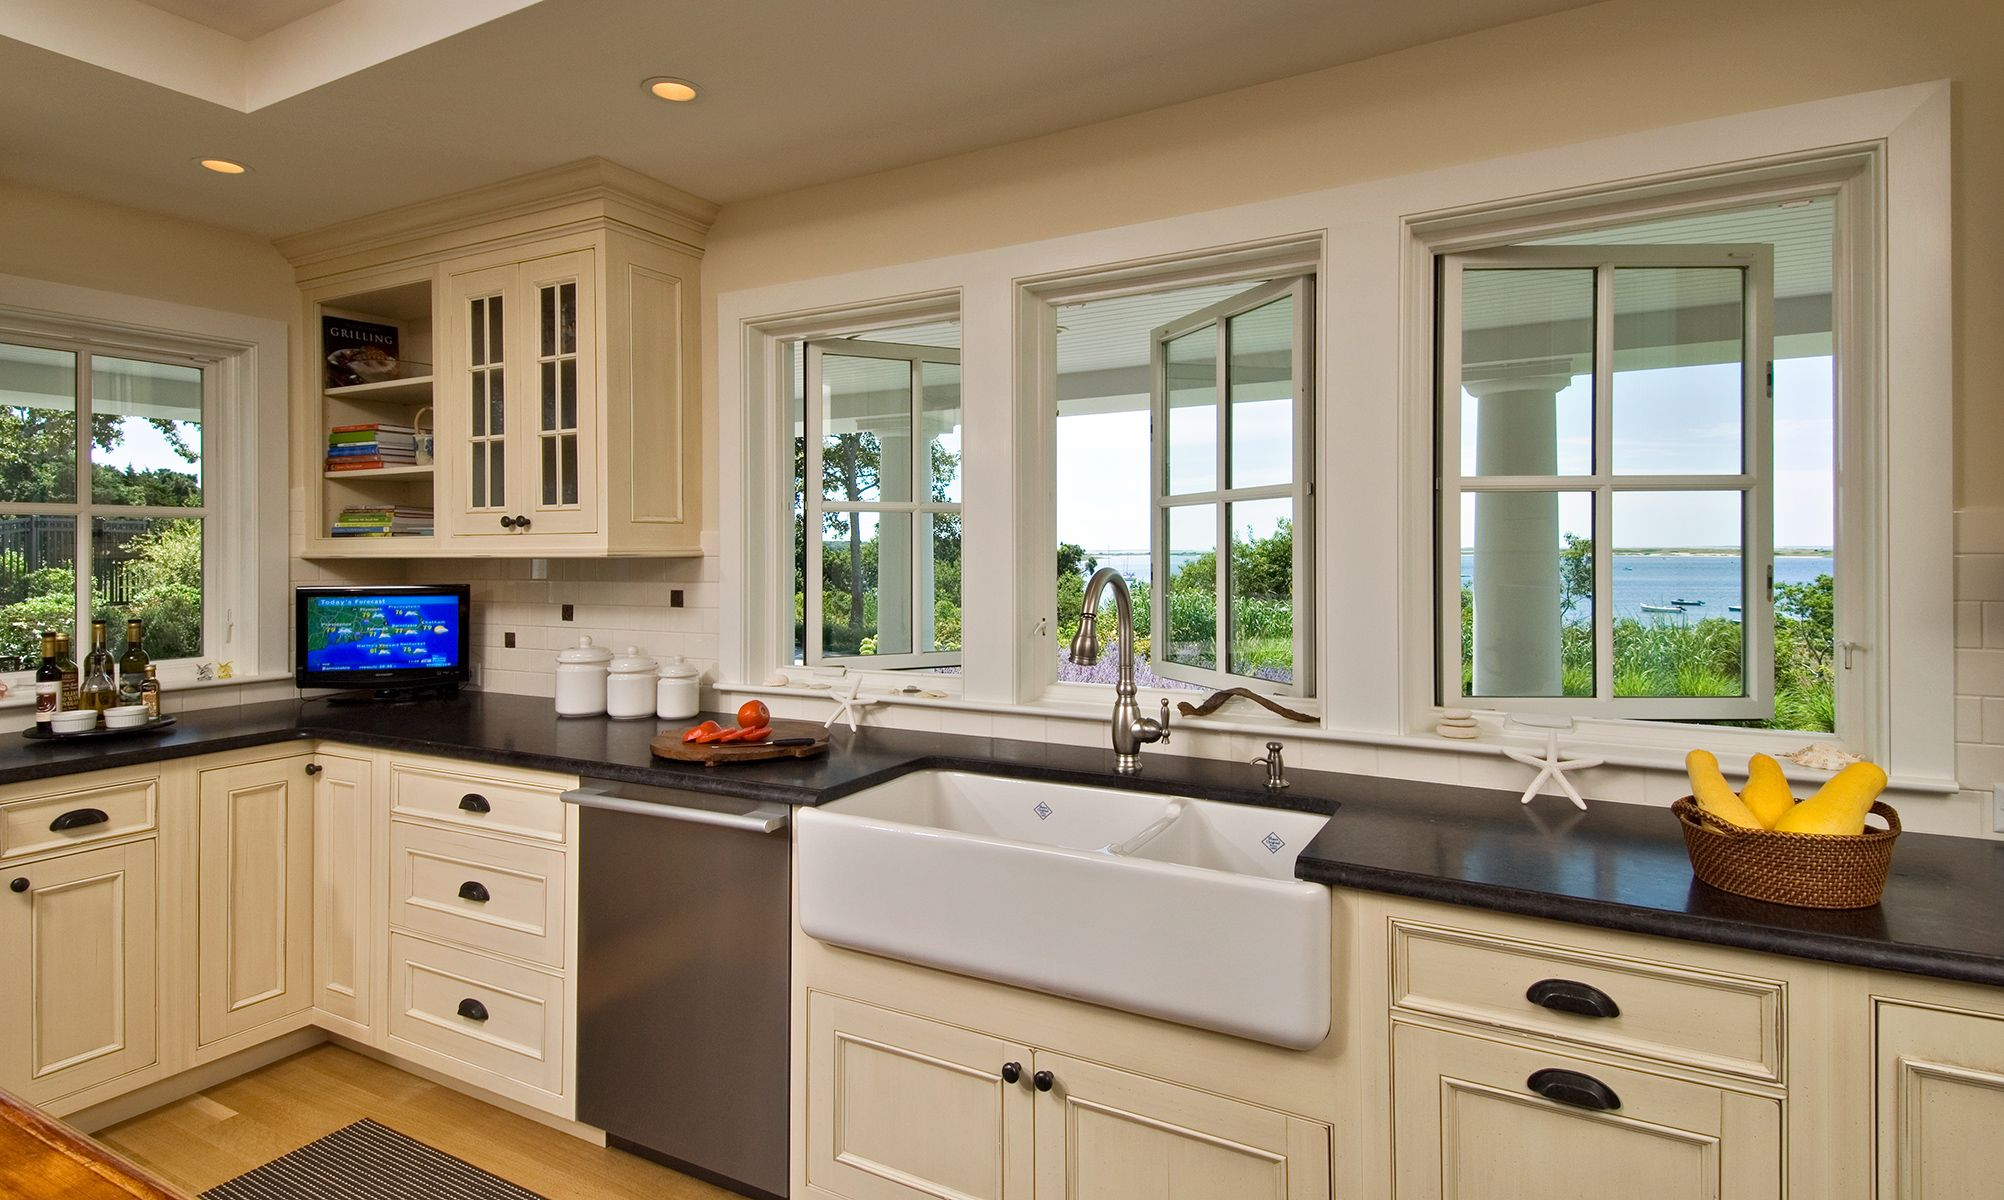 Kitchens « Classic Kitchen & Interiors | Distressed ...